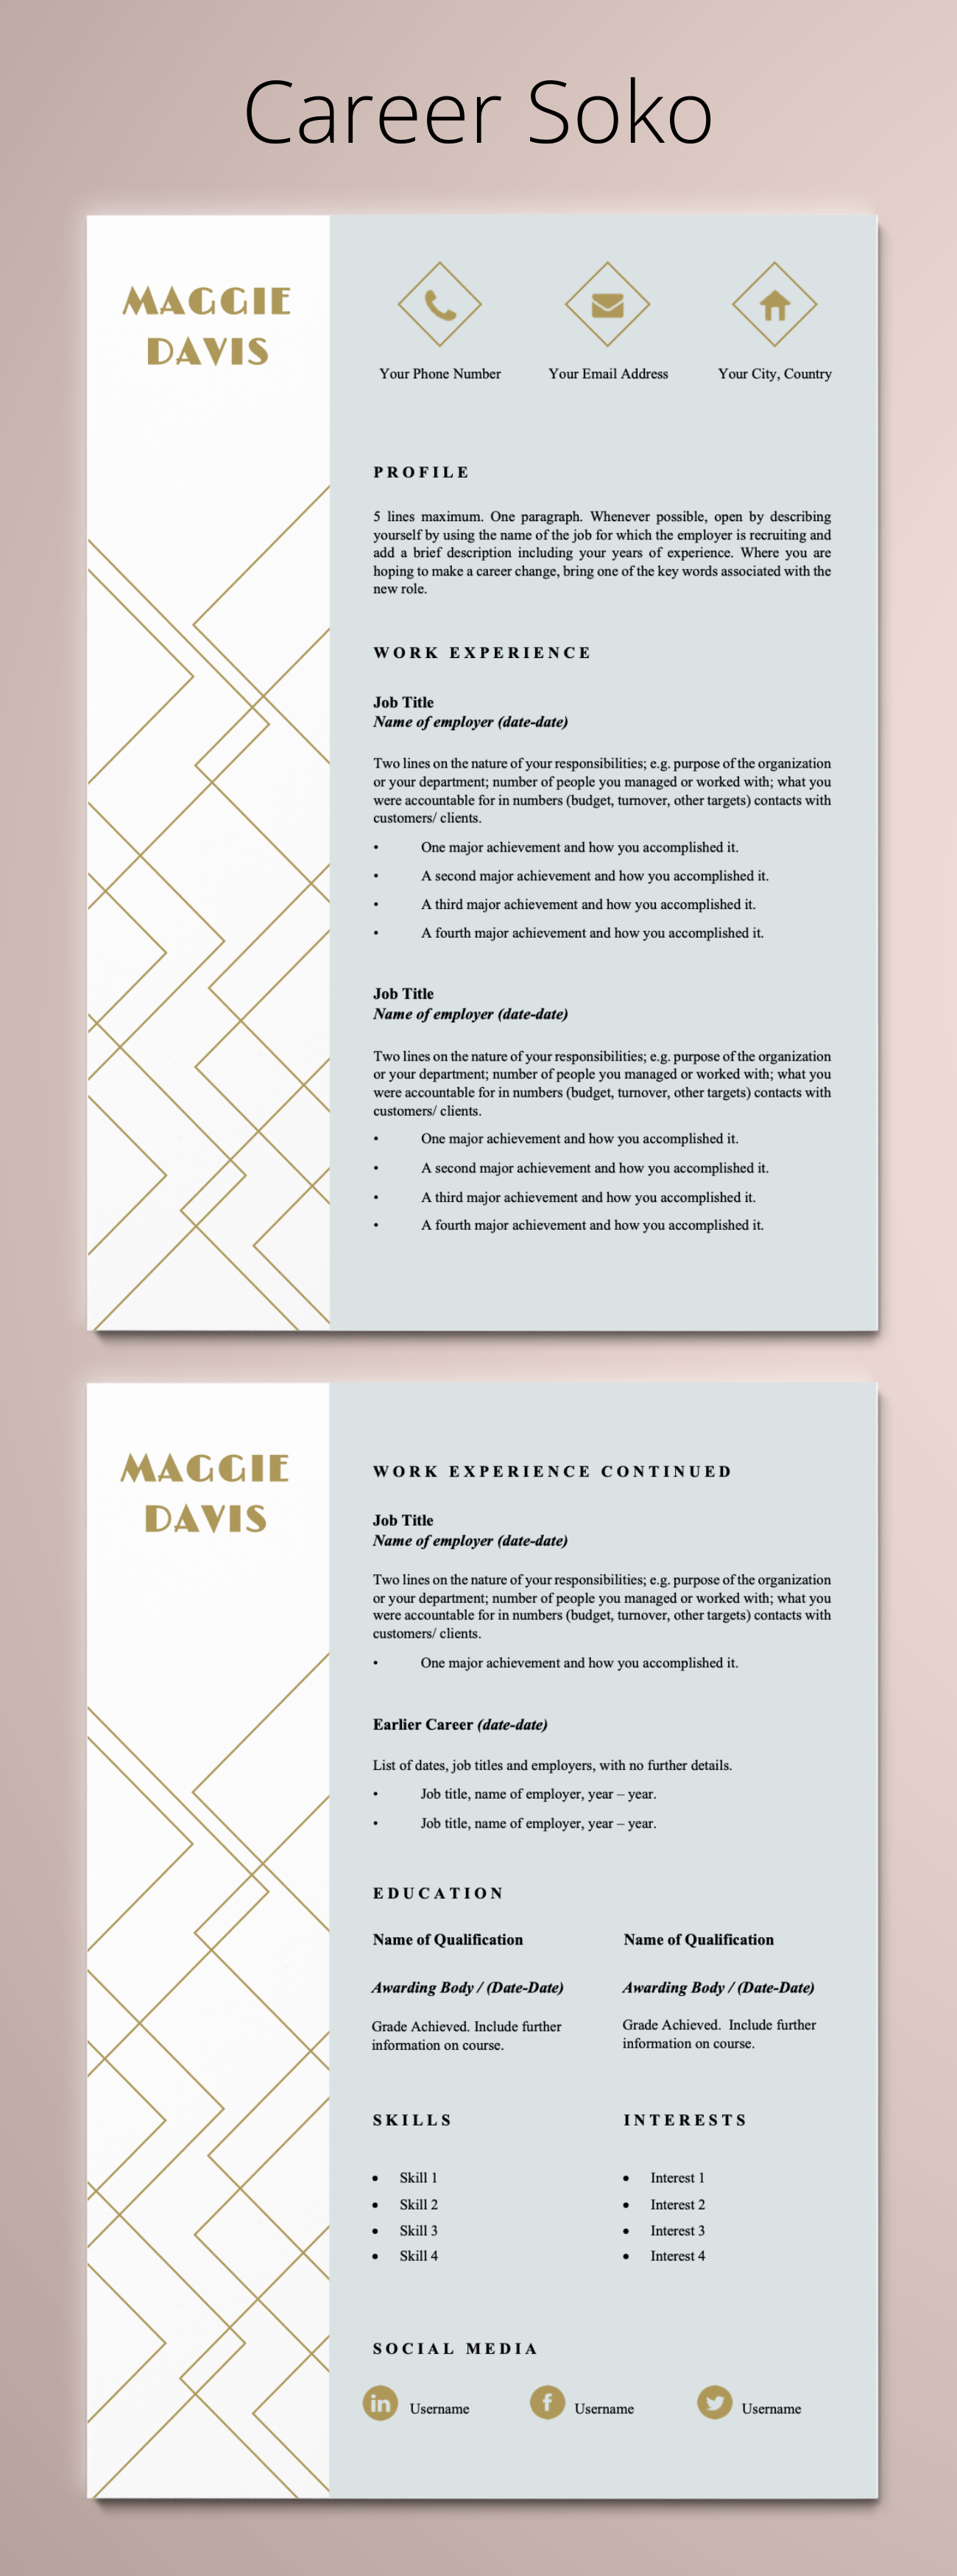 curriculum vitae minimalist resume 2 page template linkedin writers cost sample for ojt pdf icu nurse job description